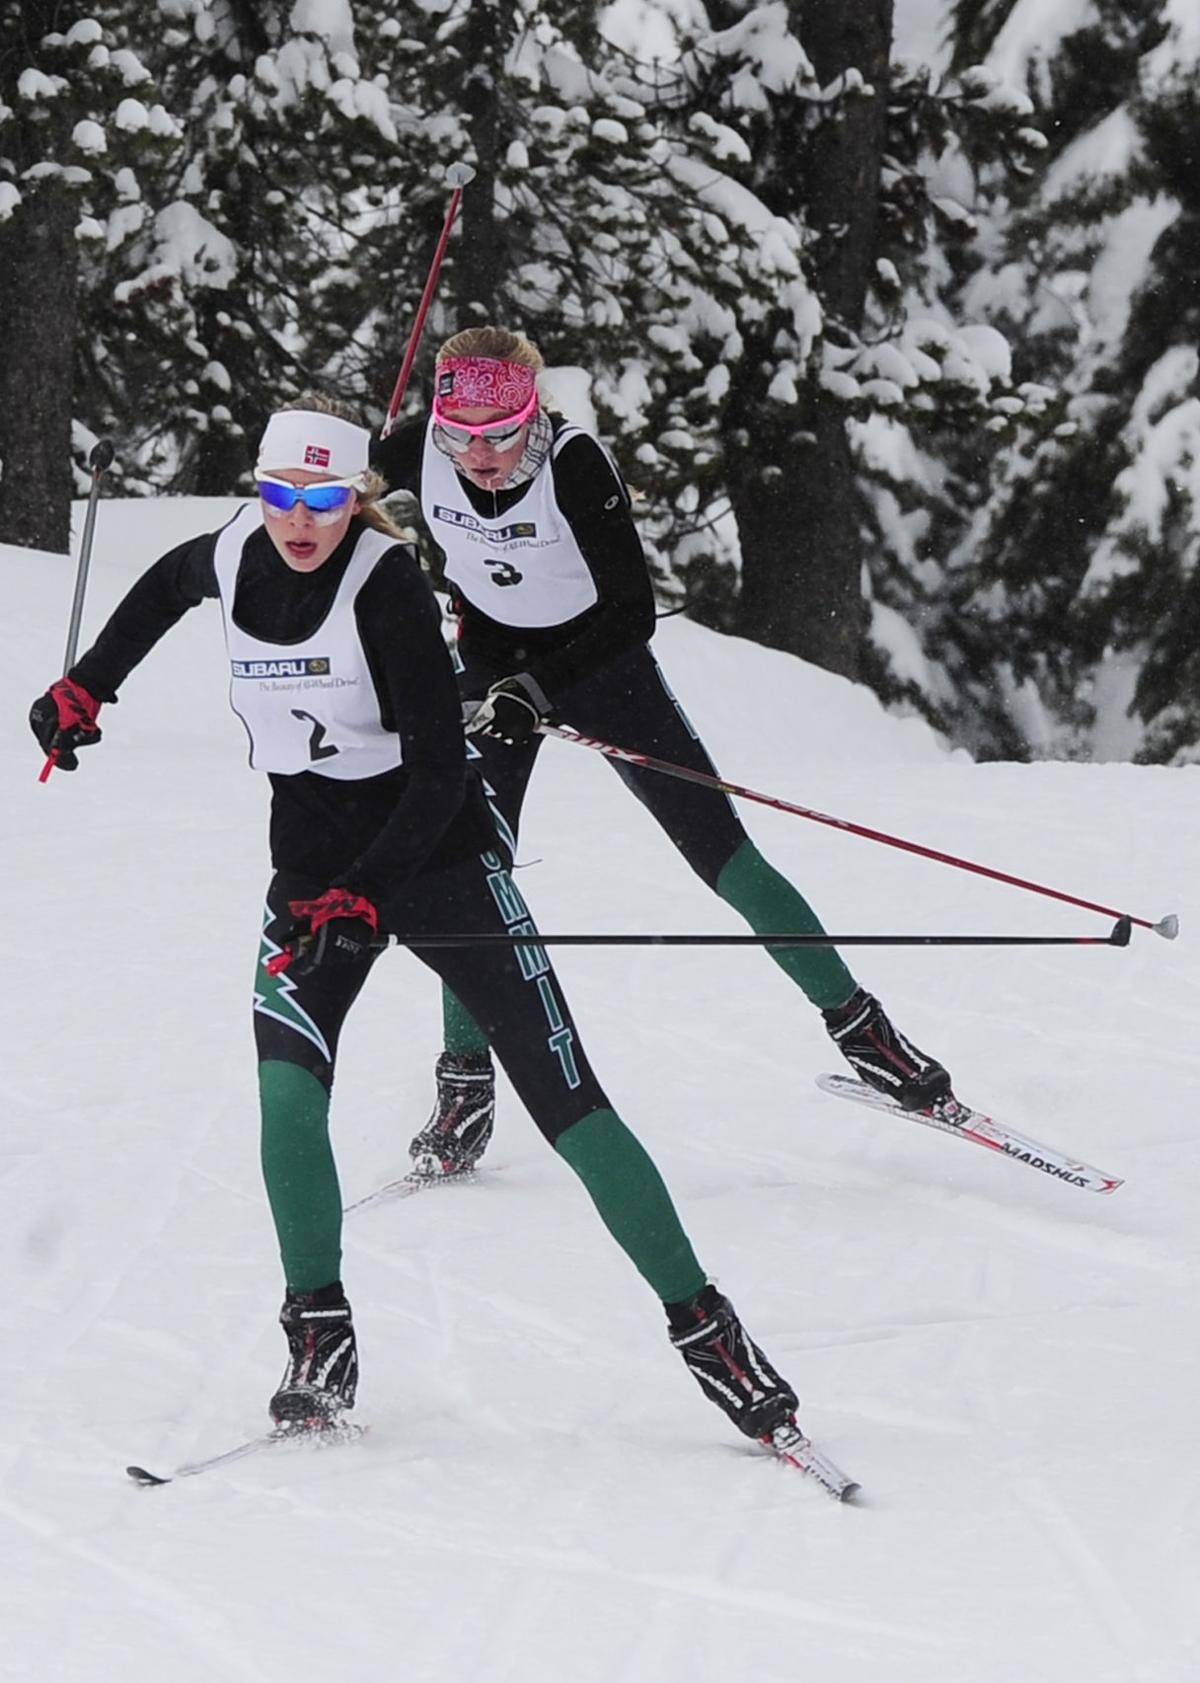 Storm nordic skiers aim for three straight